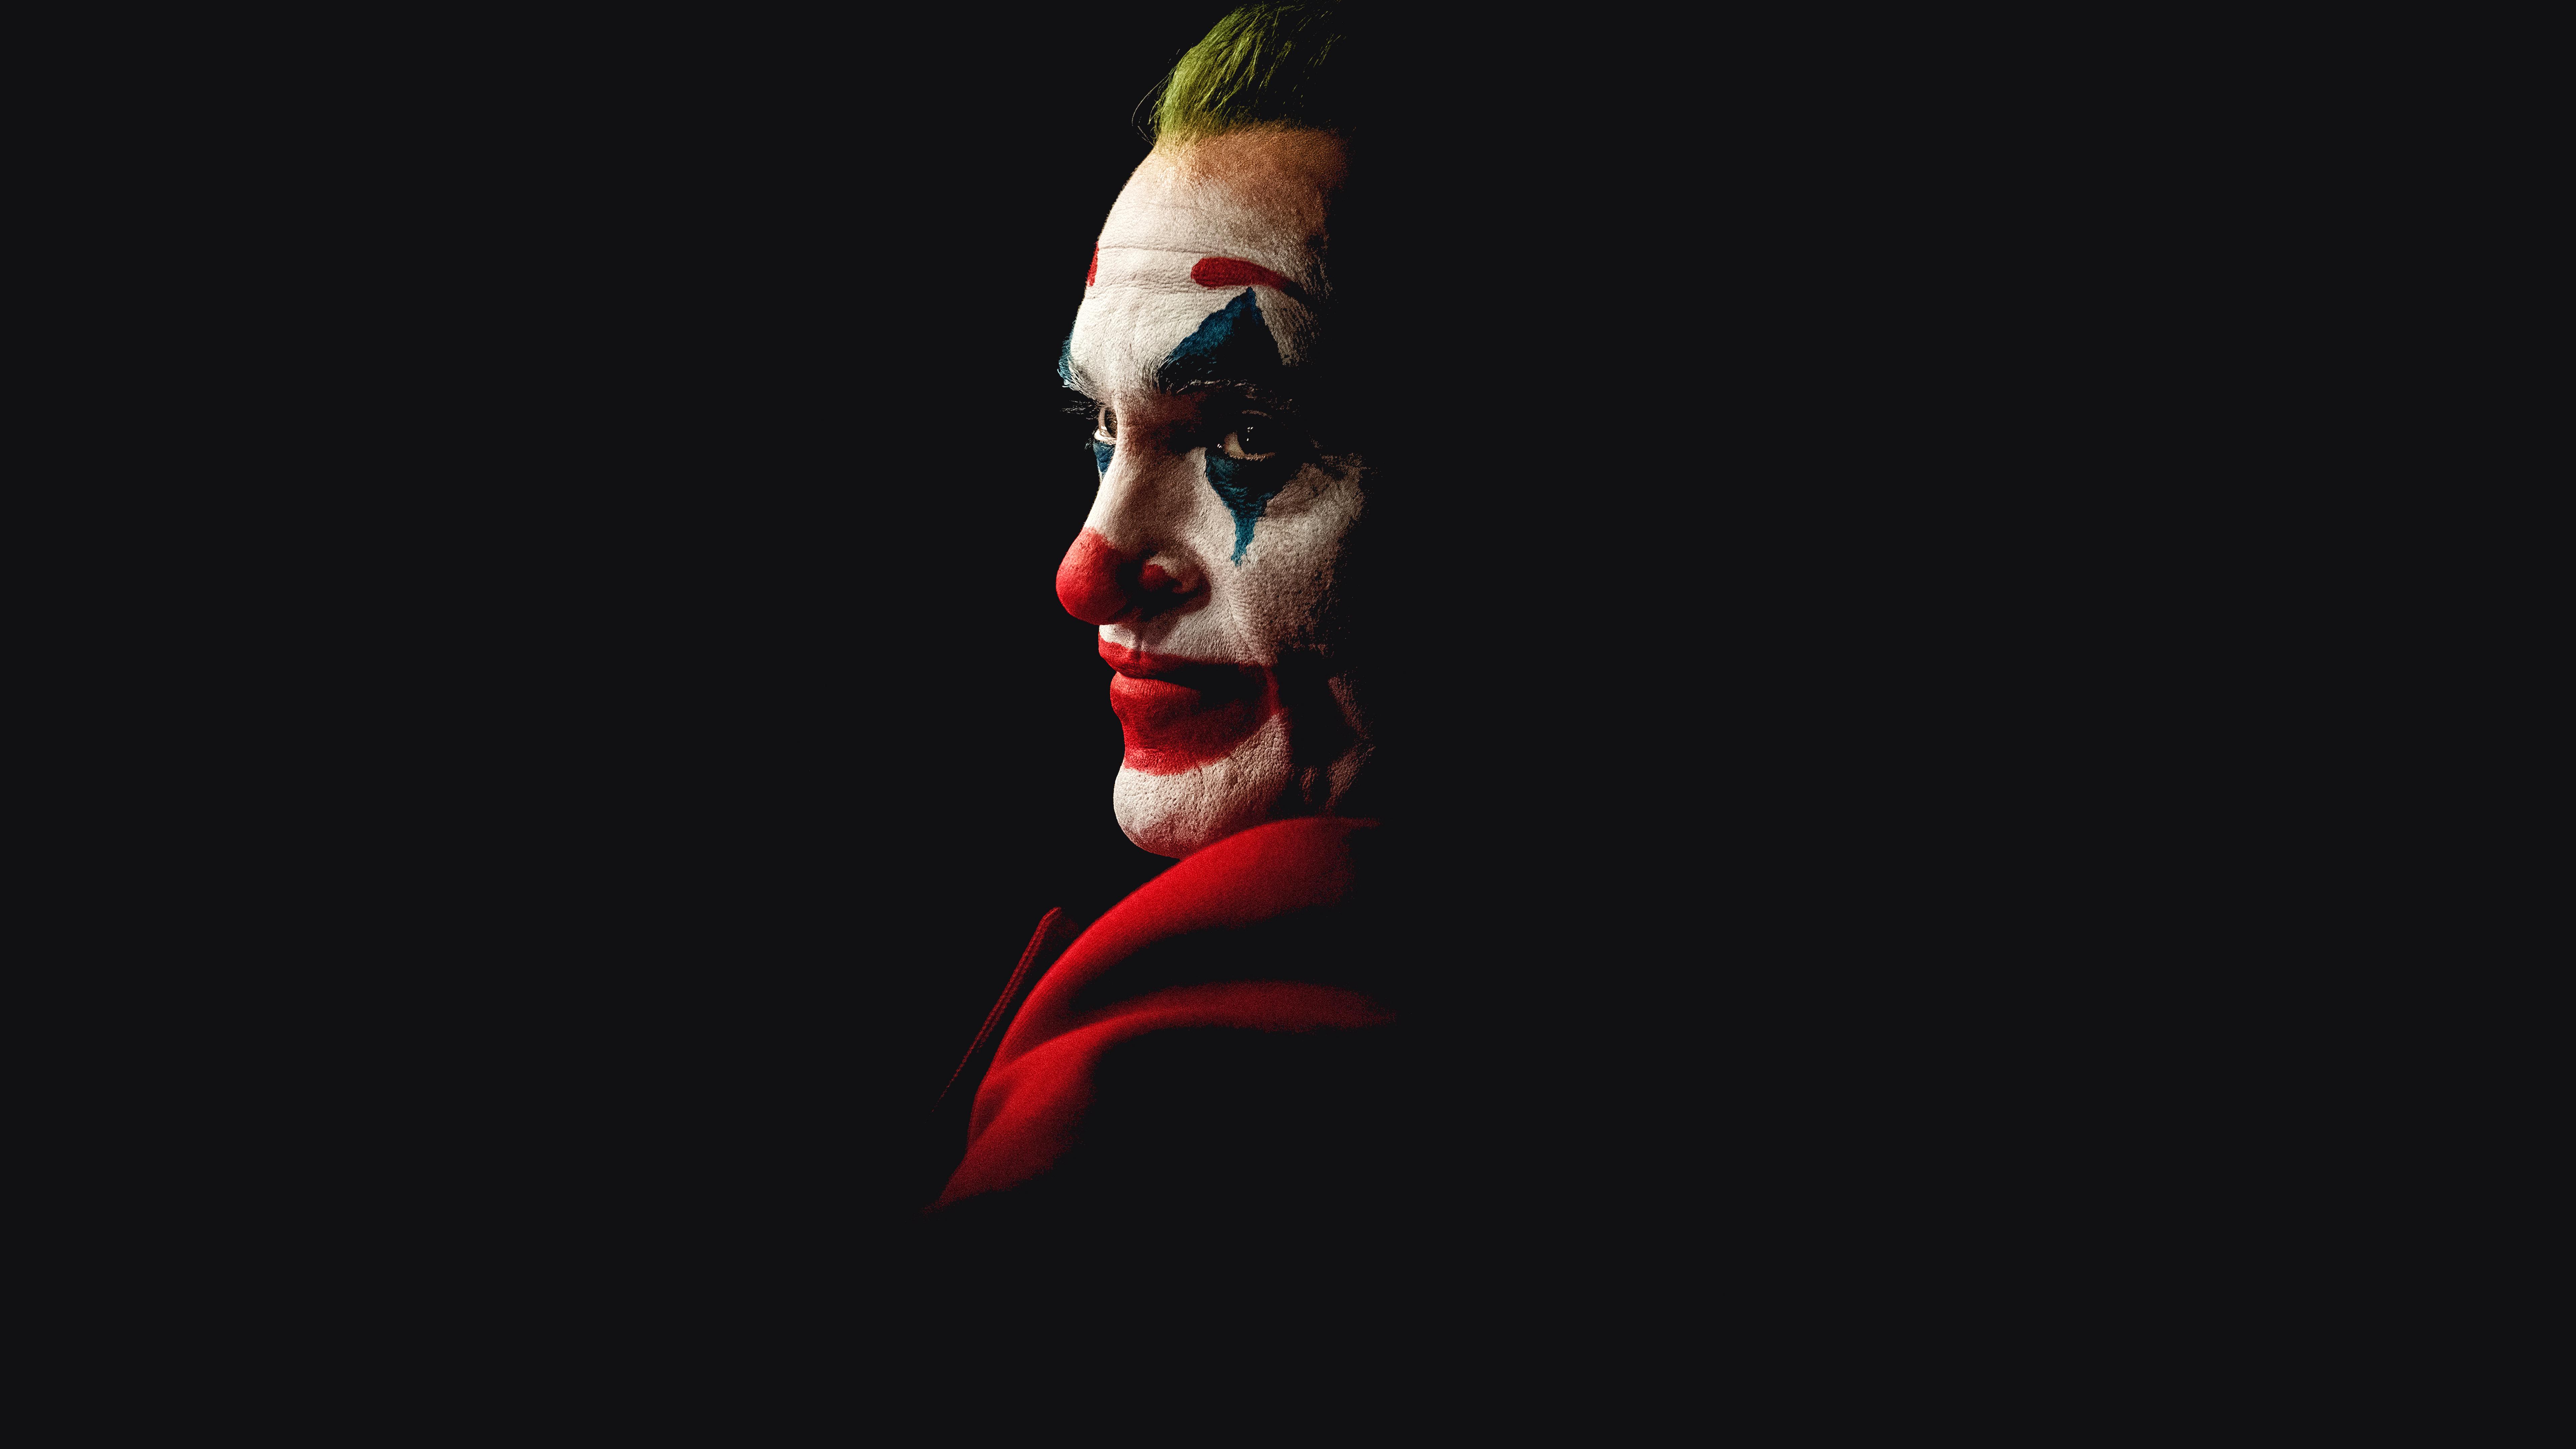 Wallpaper Joker 2019 Movie Joaquin Phoenix 7680x4320